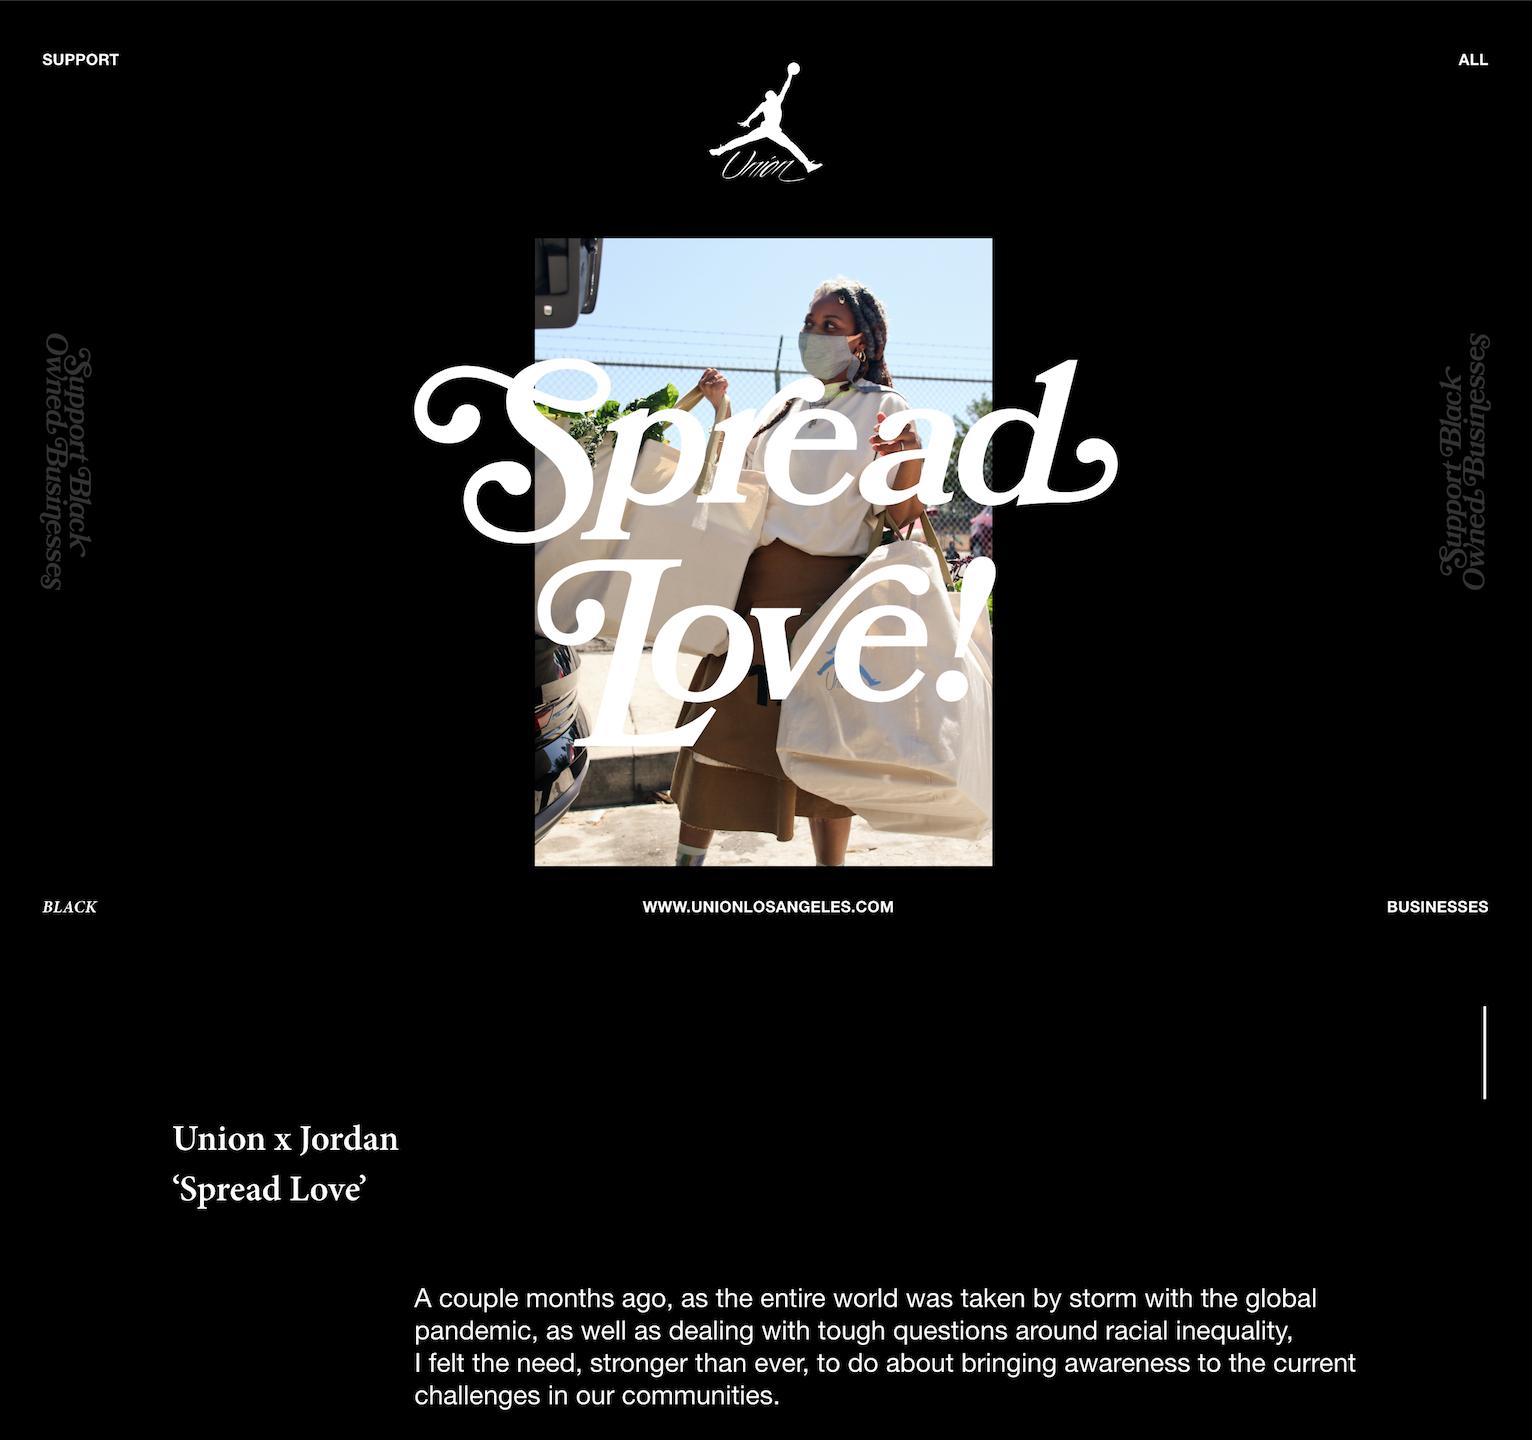 Union X Jordan - Spread Love Campaign